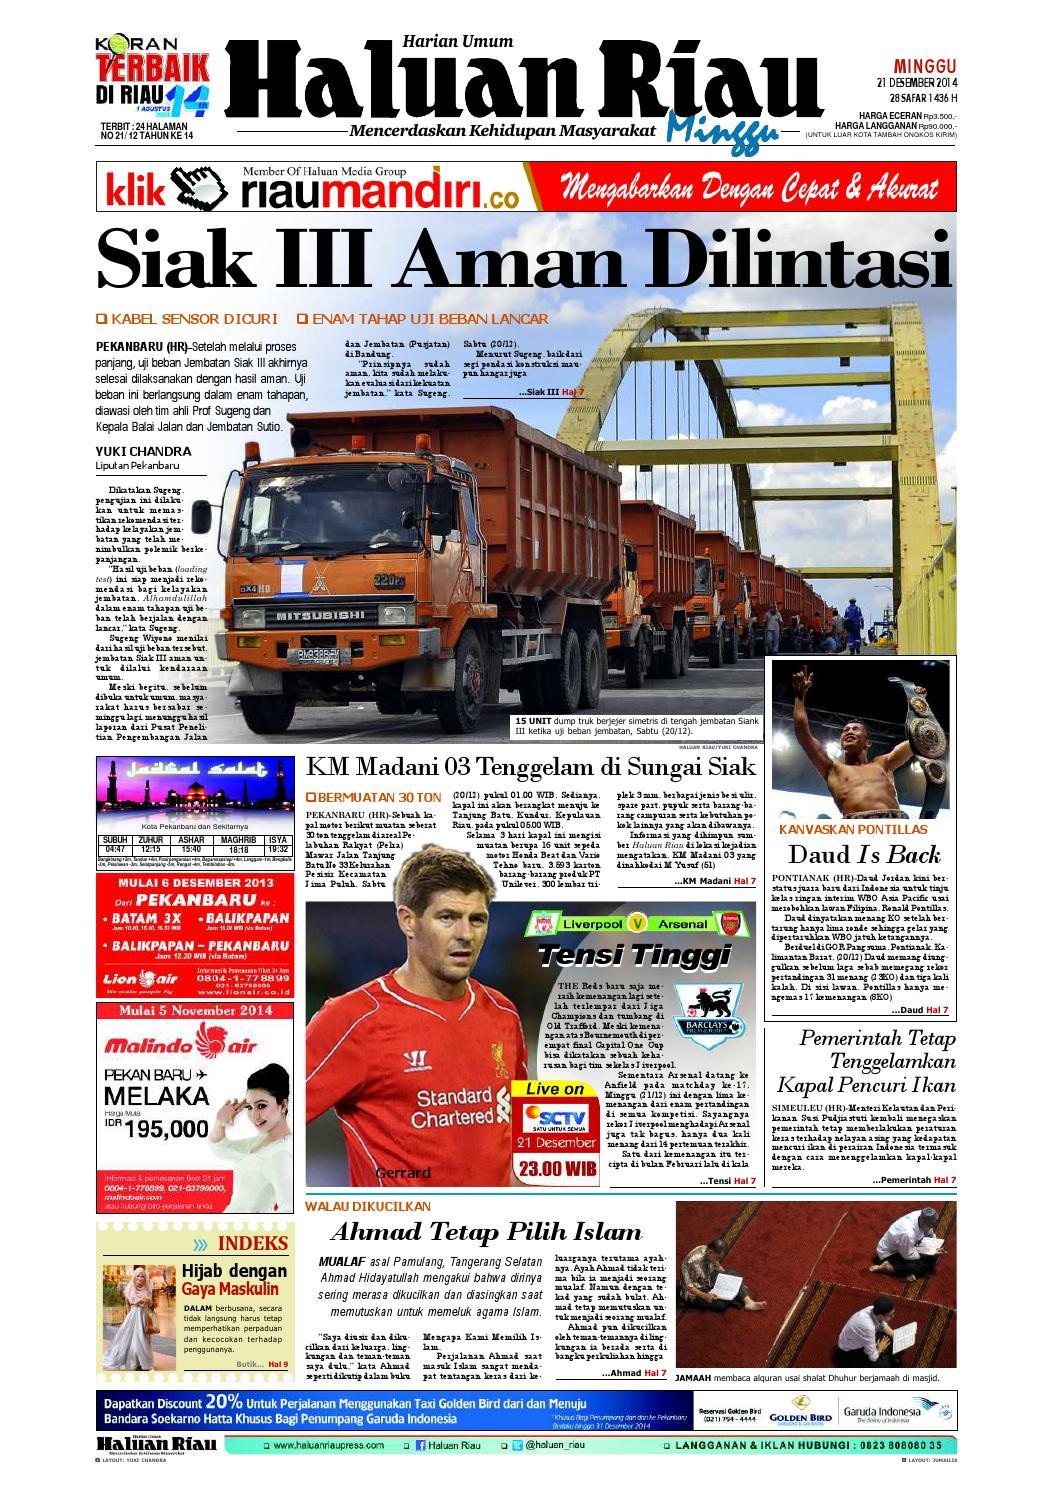 Haluanriau 2014 12 21 By Haluan Riau Issuu Warior Lc Pendek All Black Sekolah Prsmuka Kerja Santai Main Anak Dewasa